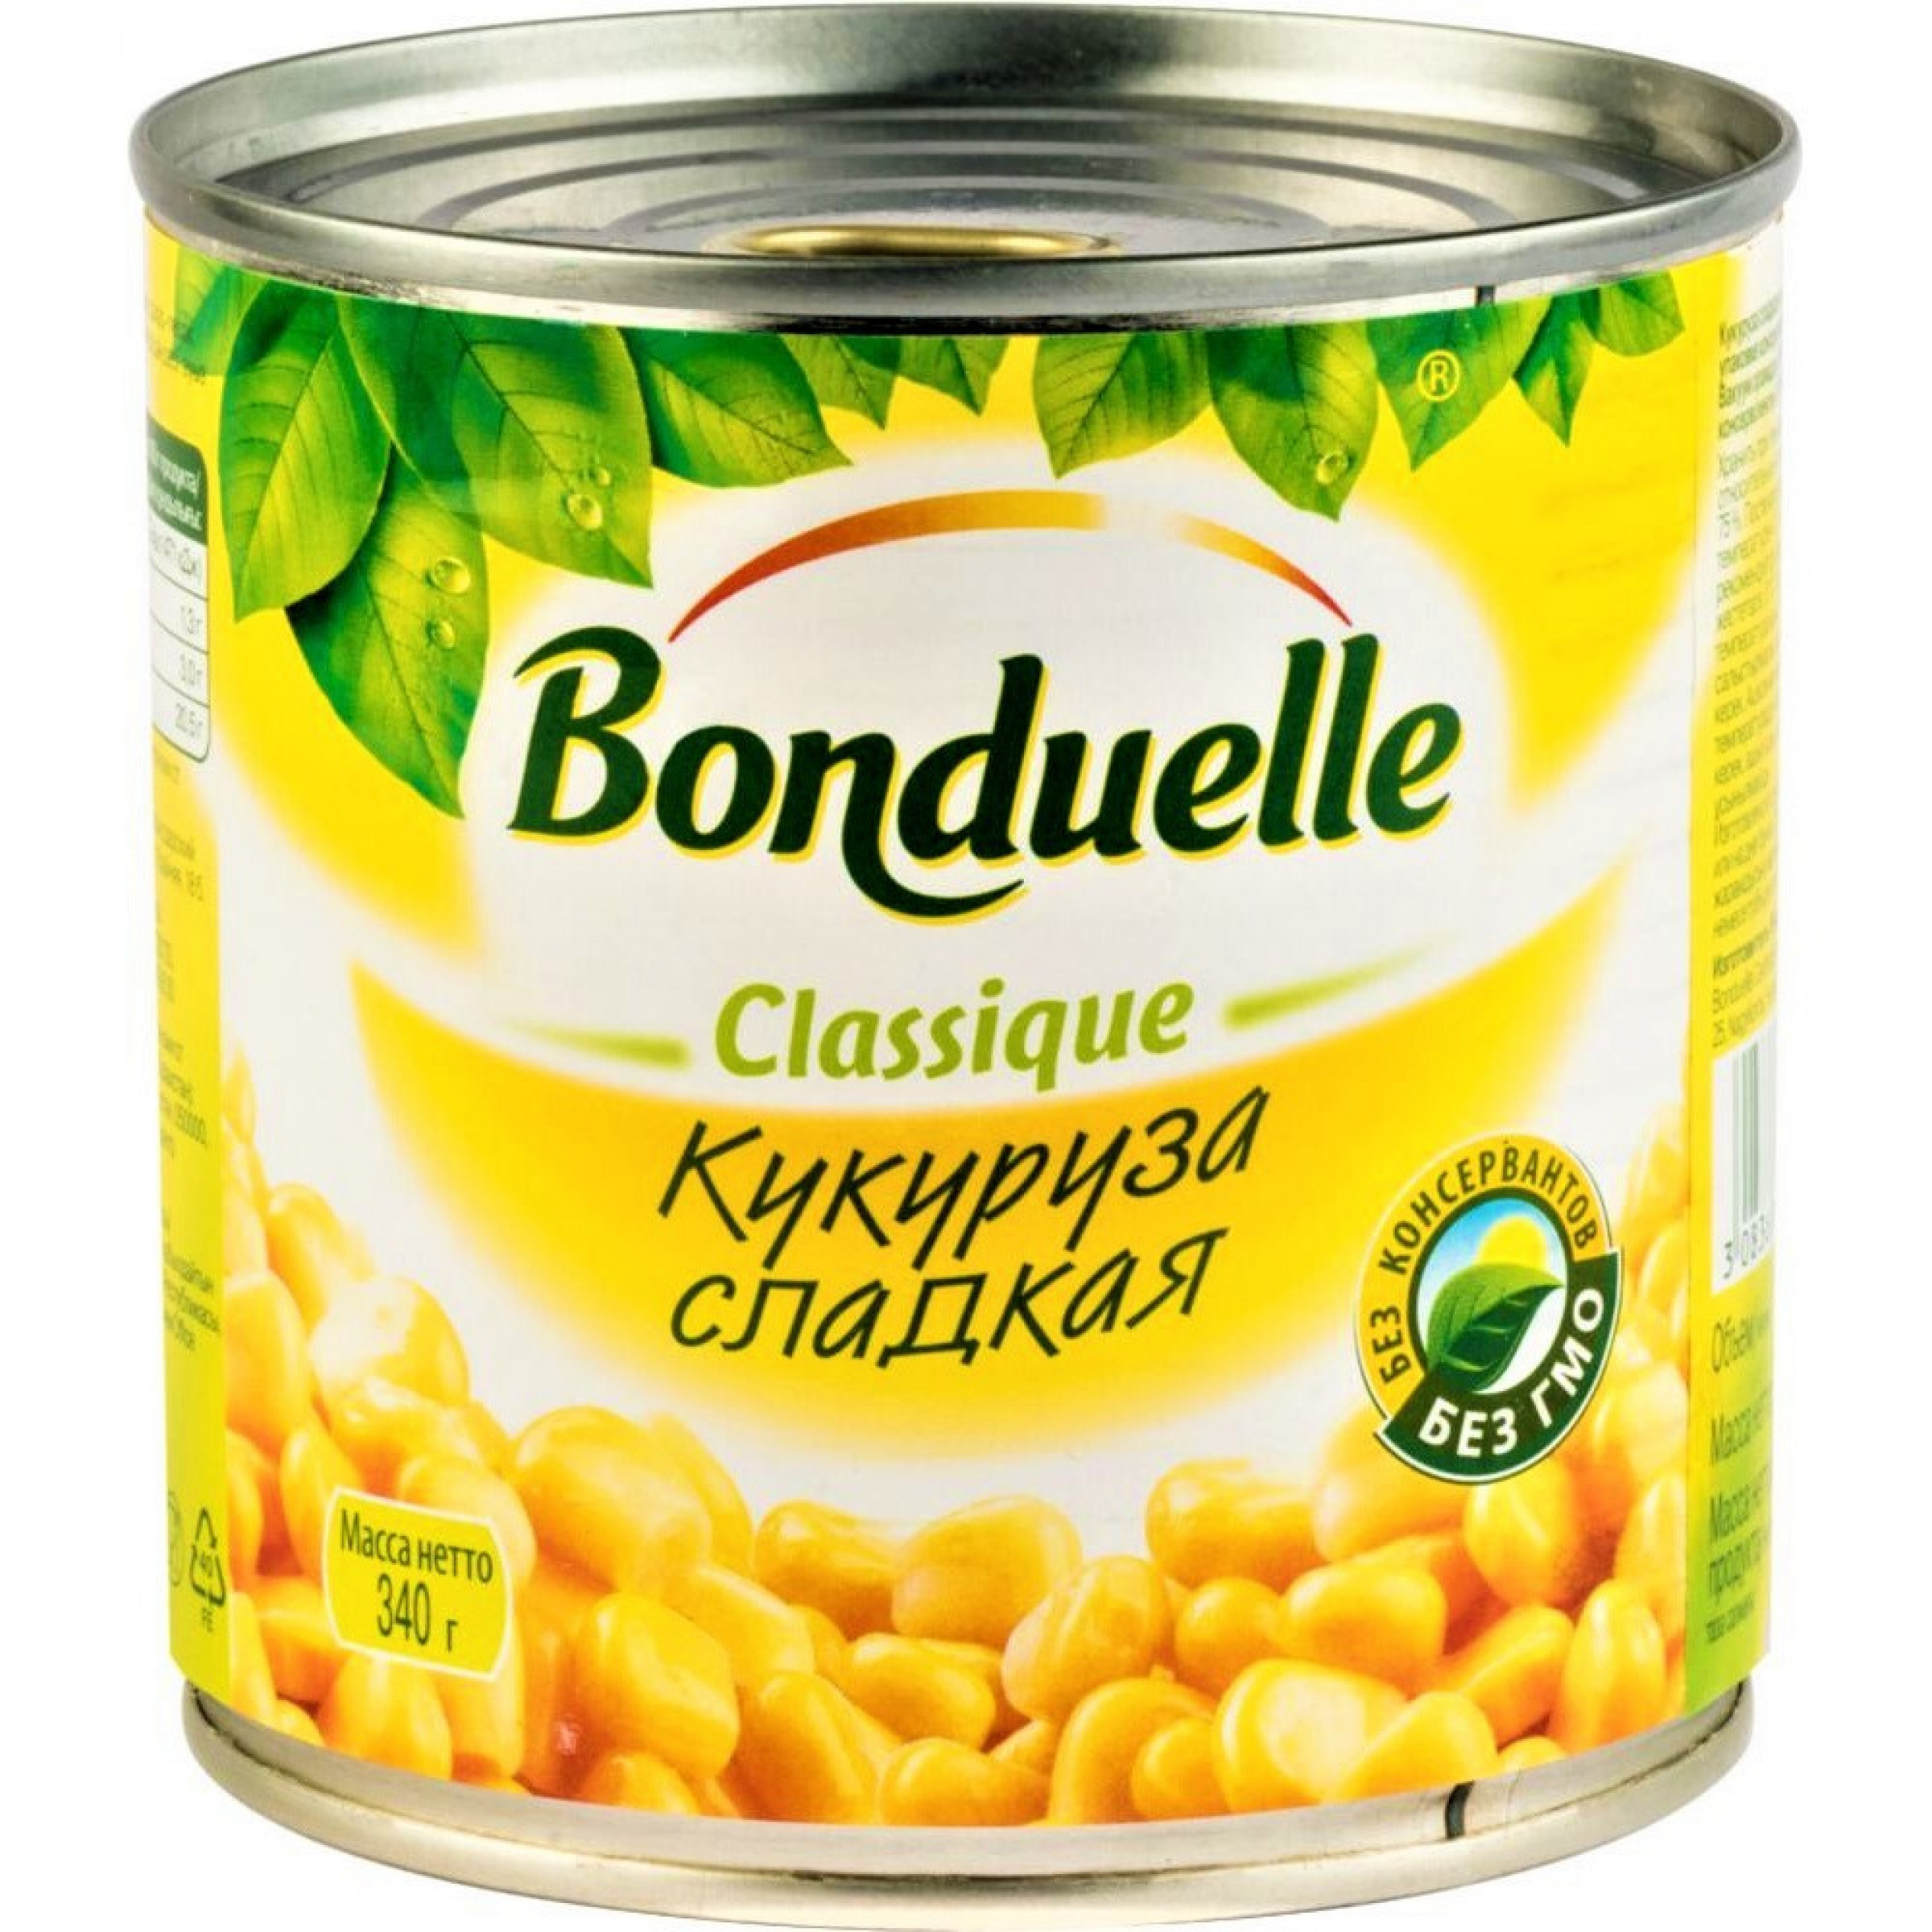 Кукуруза Бондюэль сладкая в зернах, 340гр